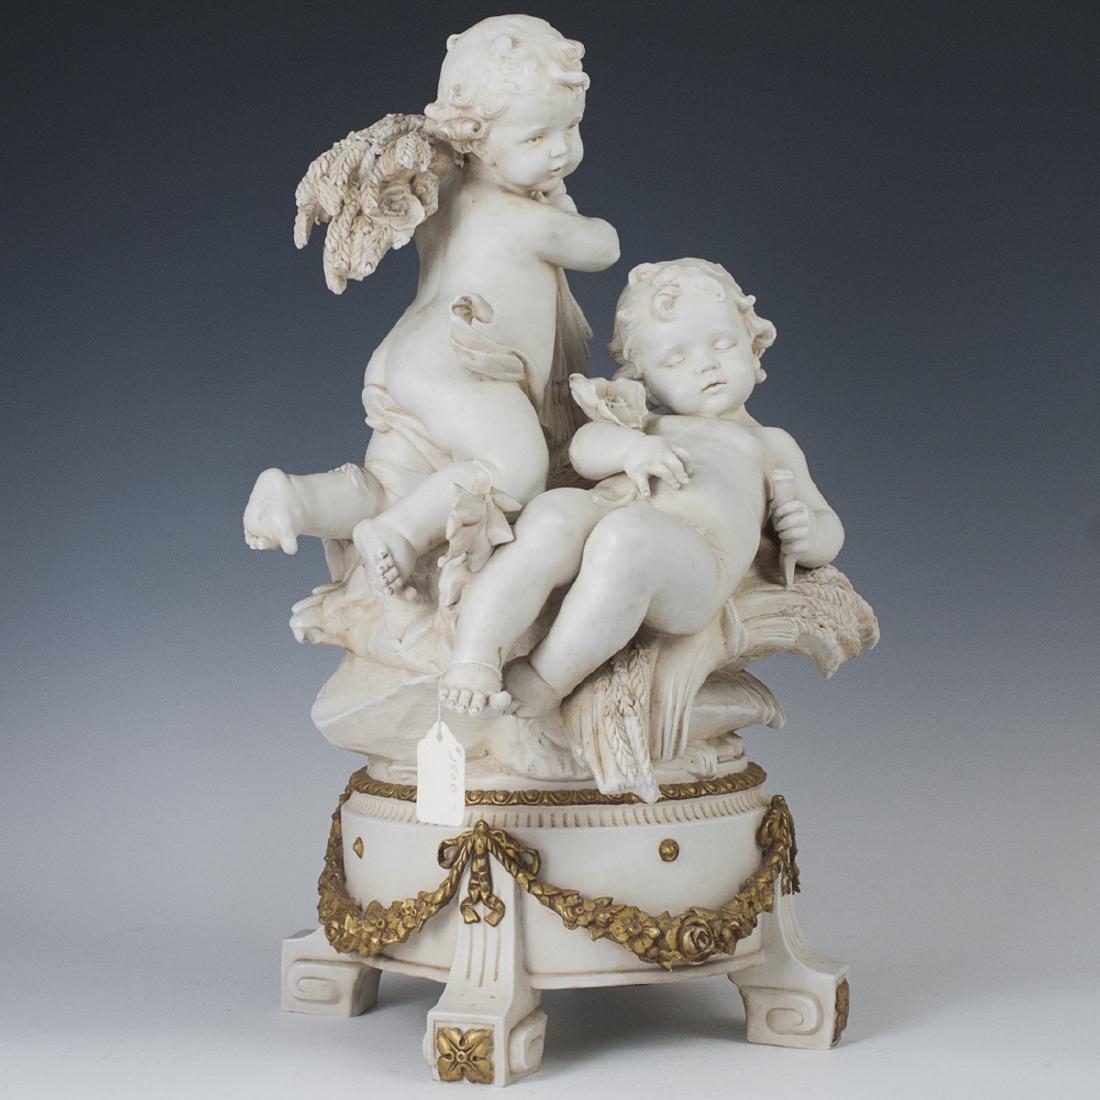 Antique French Parian Ware Sculpture